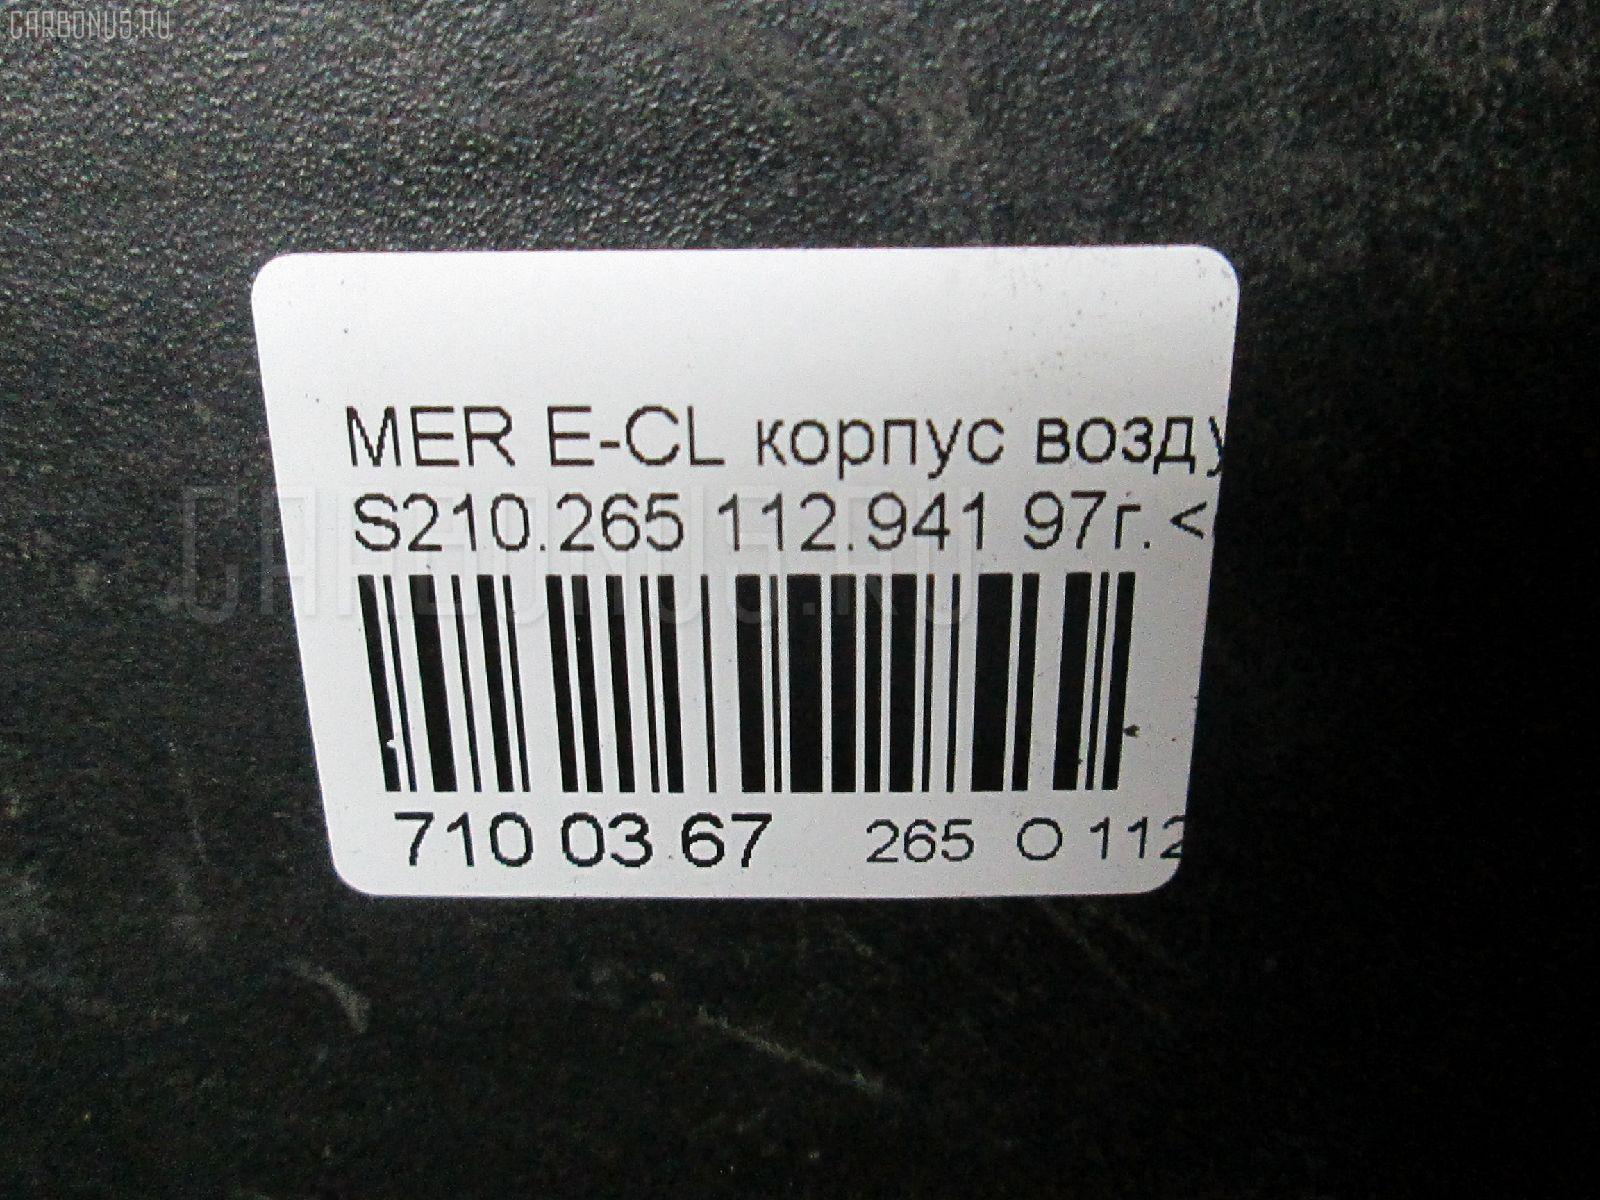 Корпус воздушного фильтра MERCEDES-BENZ E-CLASS STATION WAGON S210.265 112.941 Фото 7